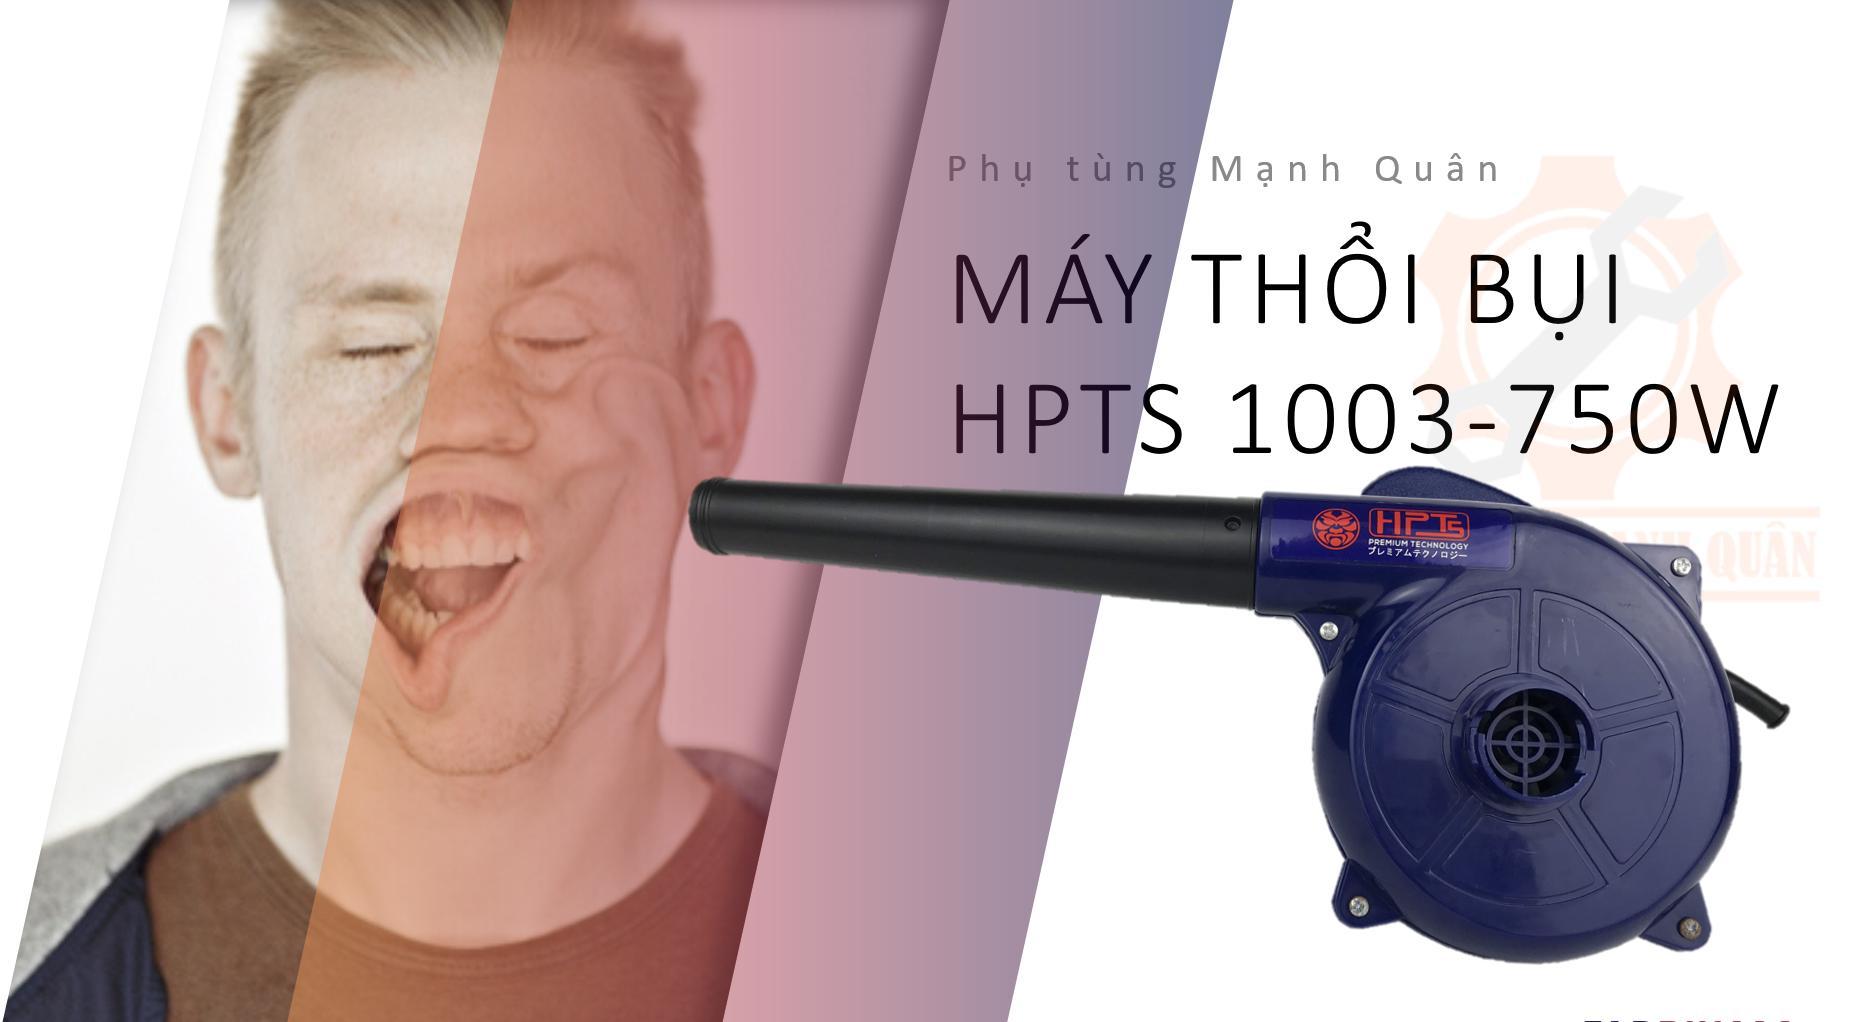 Máy thổi bụi HPTS 100m 750W